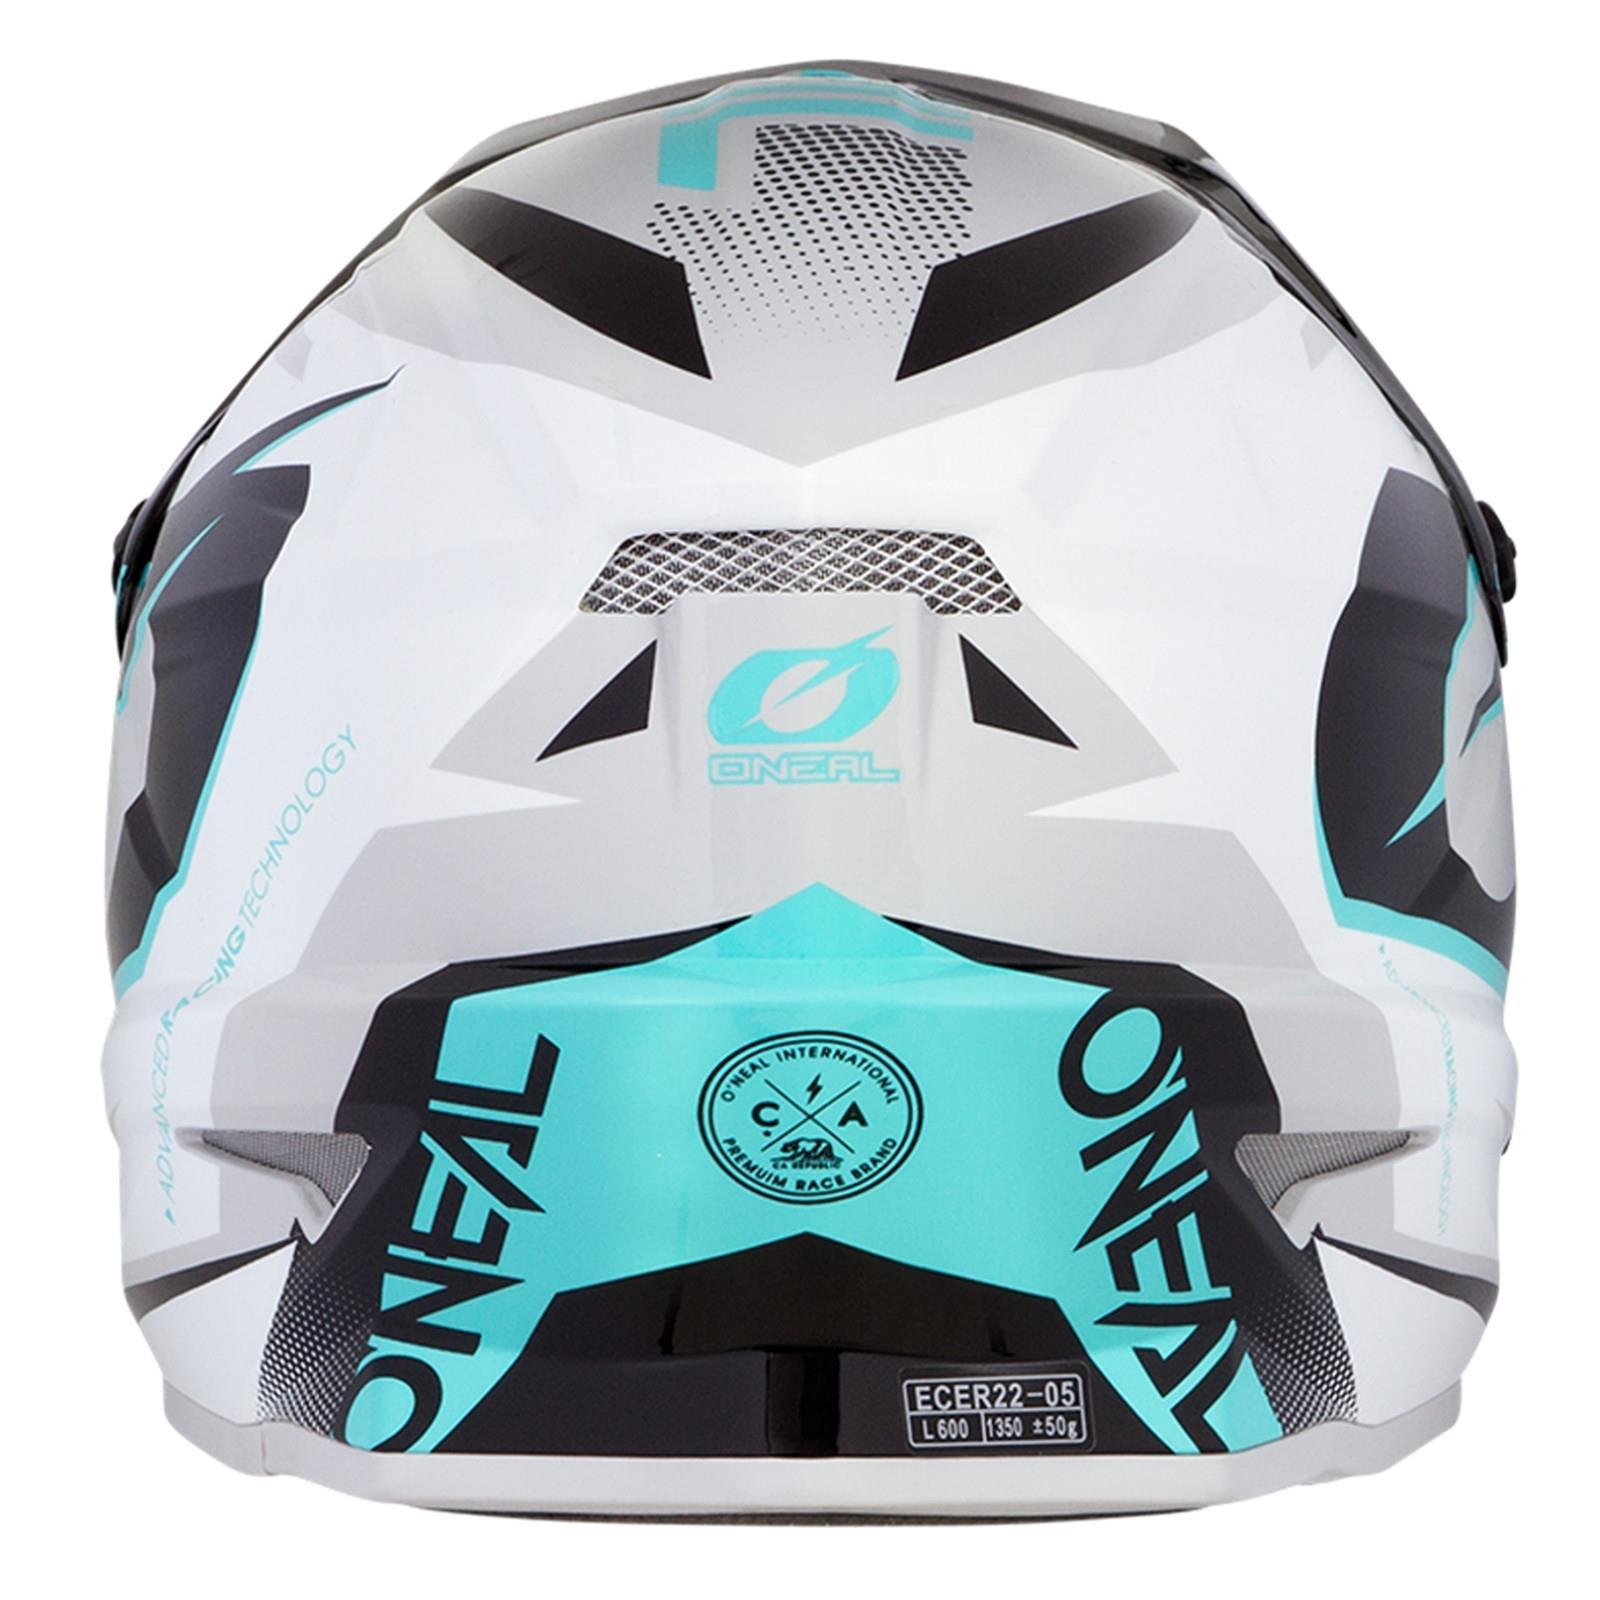 ONeal-Motocross-casco-MX-ENDURO-MOTO-BICI-FUORISTRADA-CROSS-Series-Adventure miniatura 43